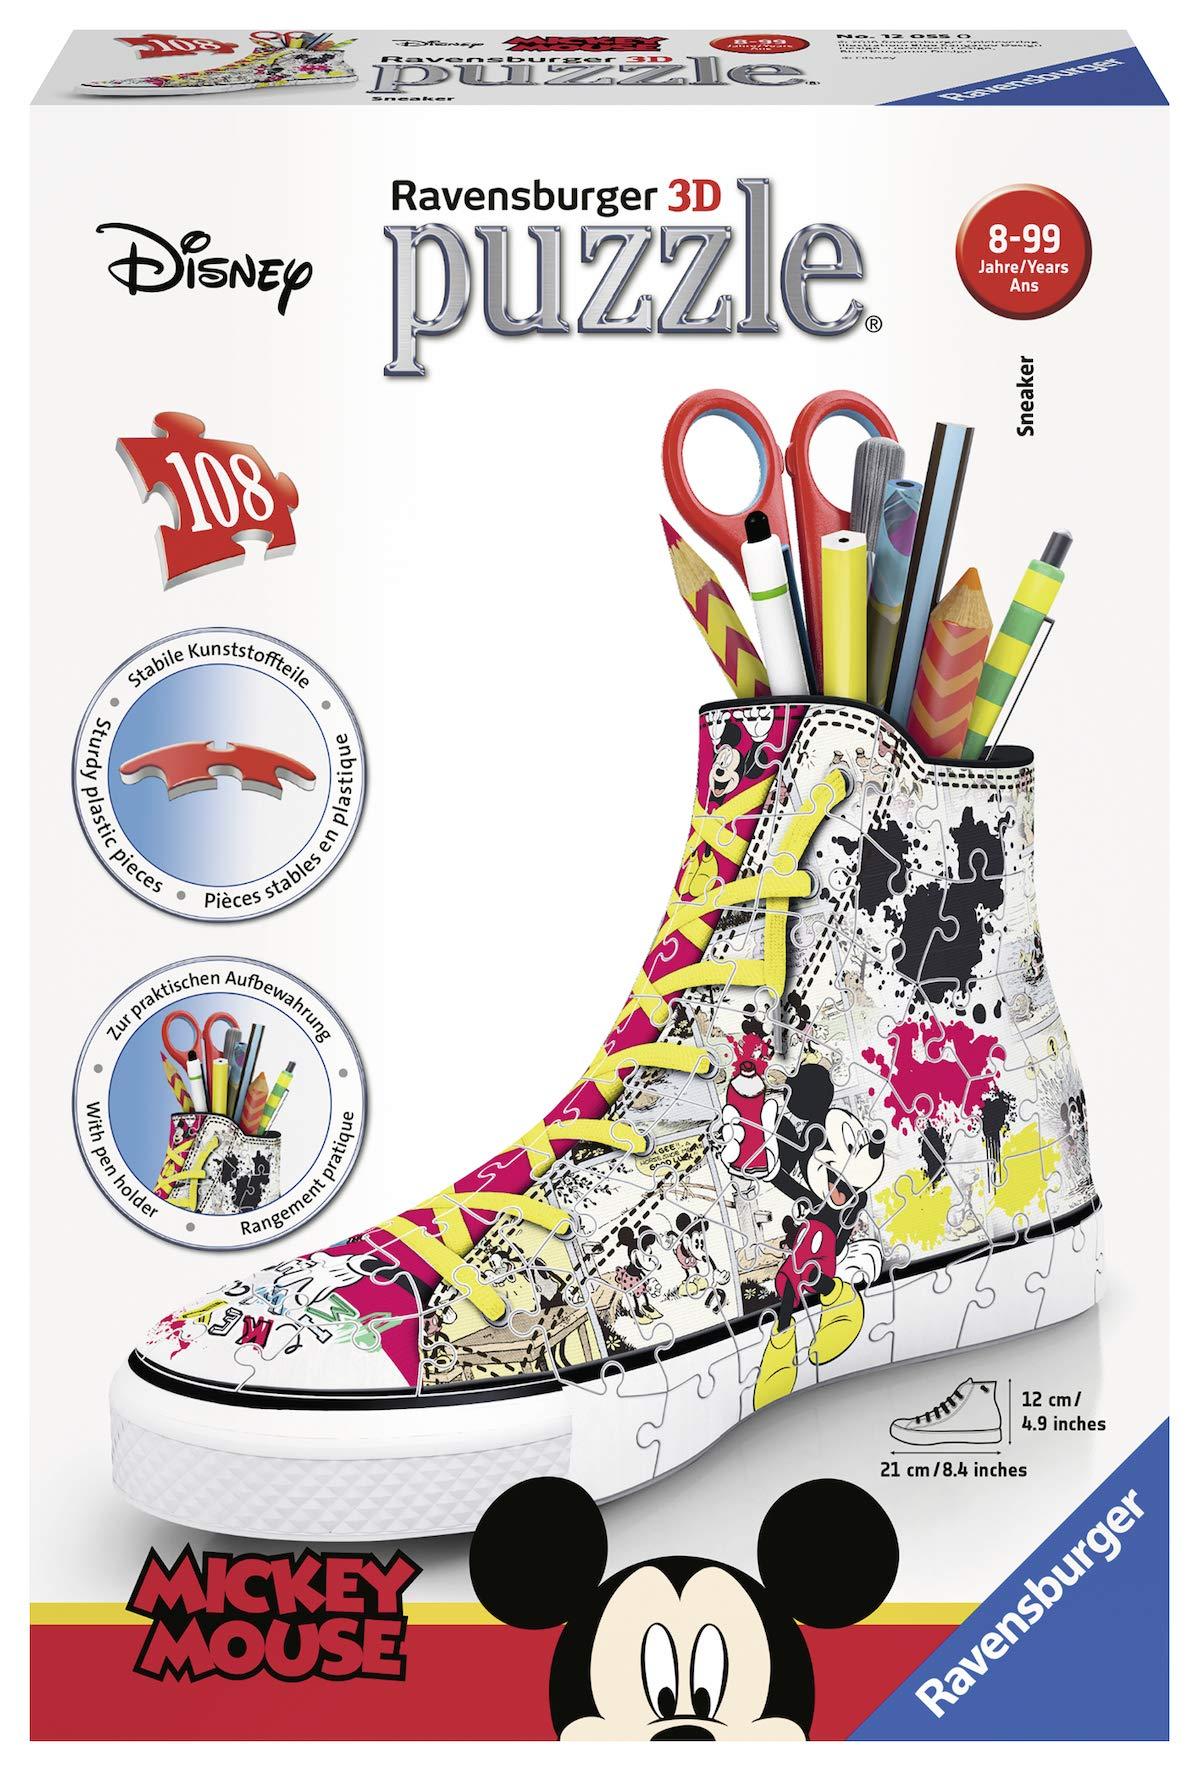 Ravensburger 意大利 12055 - Disney 经典运动鞋米老鼠拼图,3d 铅笔盒